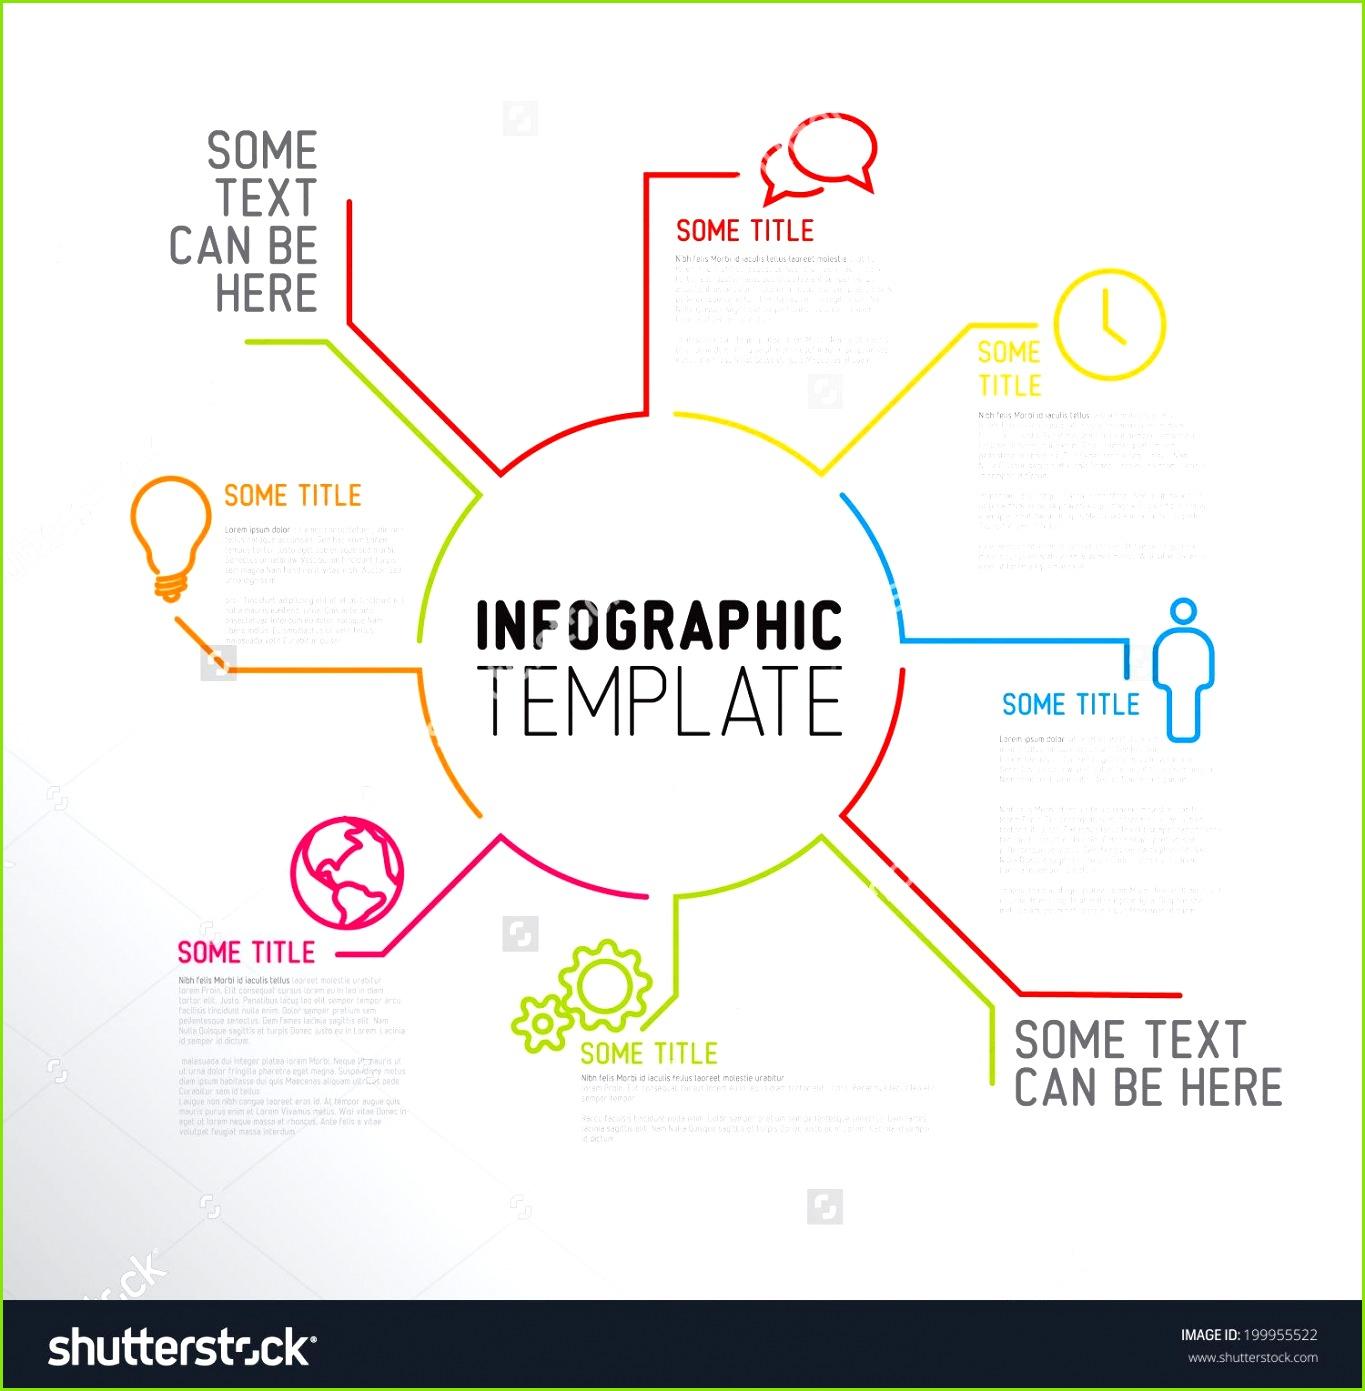 Bp Infographic – ¢Ë†Å¡ Free Powerpoint Timeline Templates top 0d Plete Powerpoint